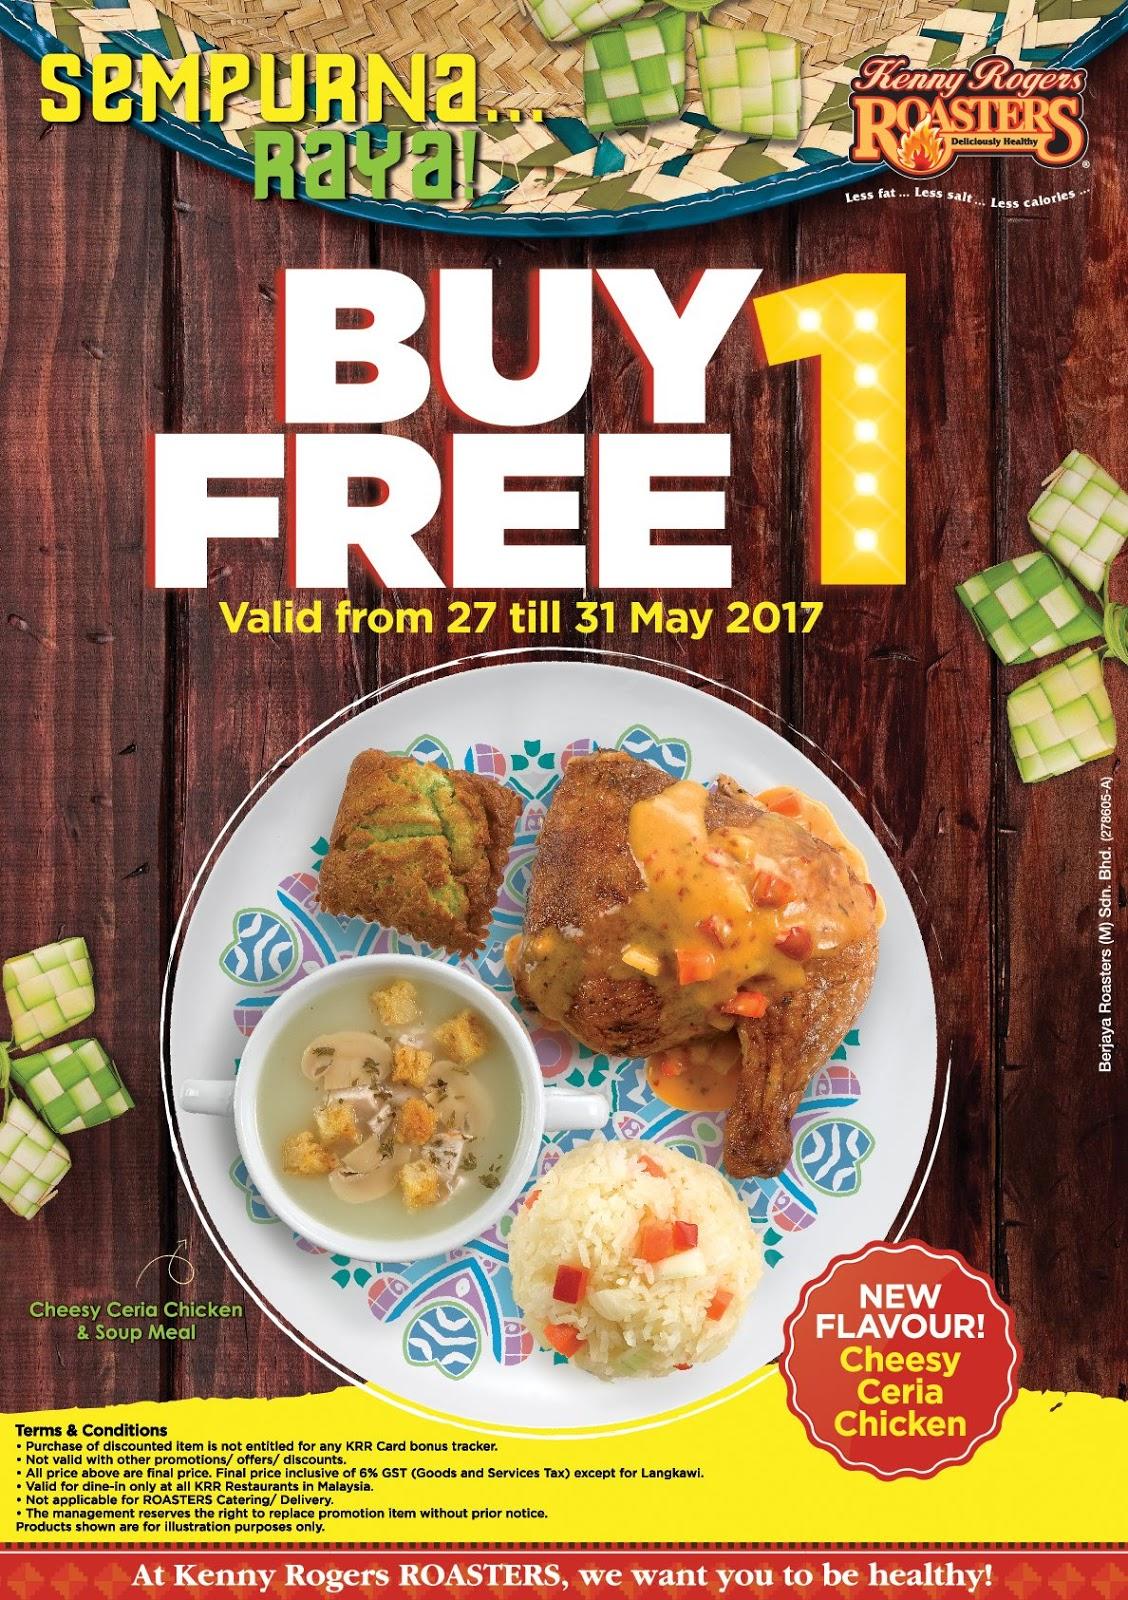 Kenny Rogers ROASTERS Buy 1 FREE 1 Cheesy Ceria Chicken ...